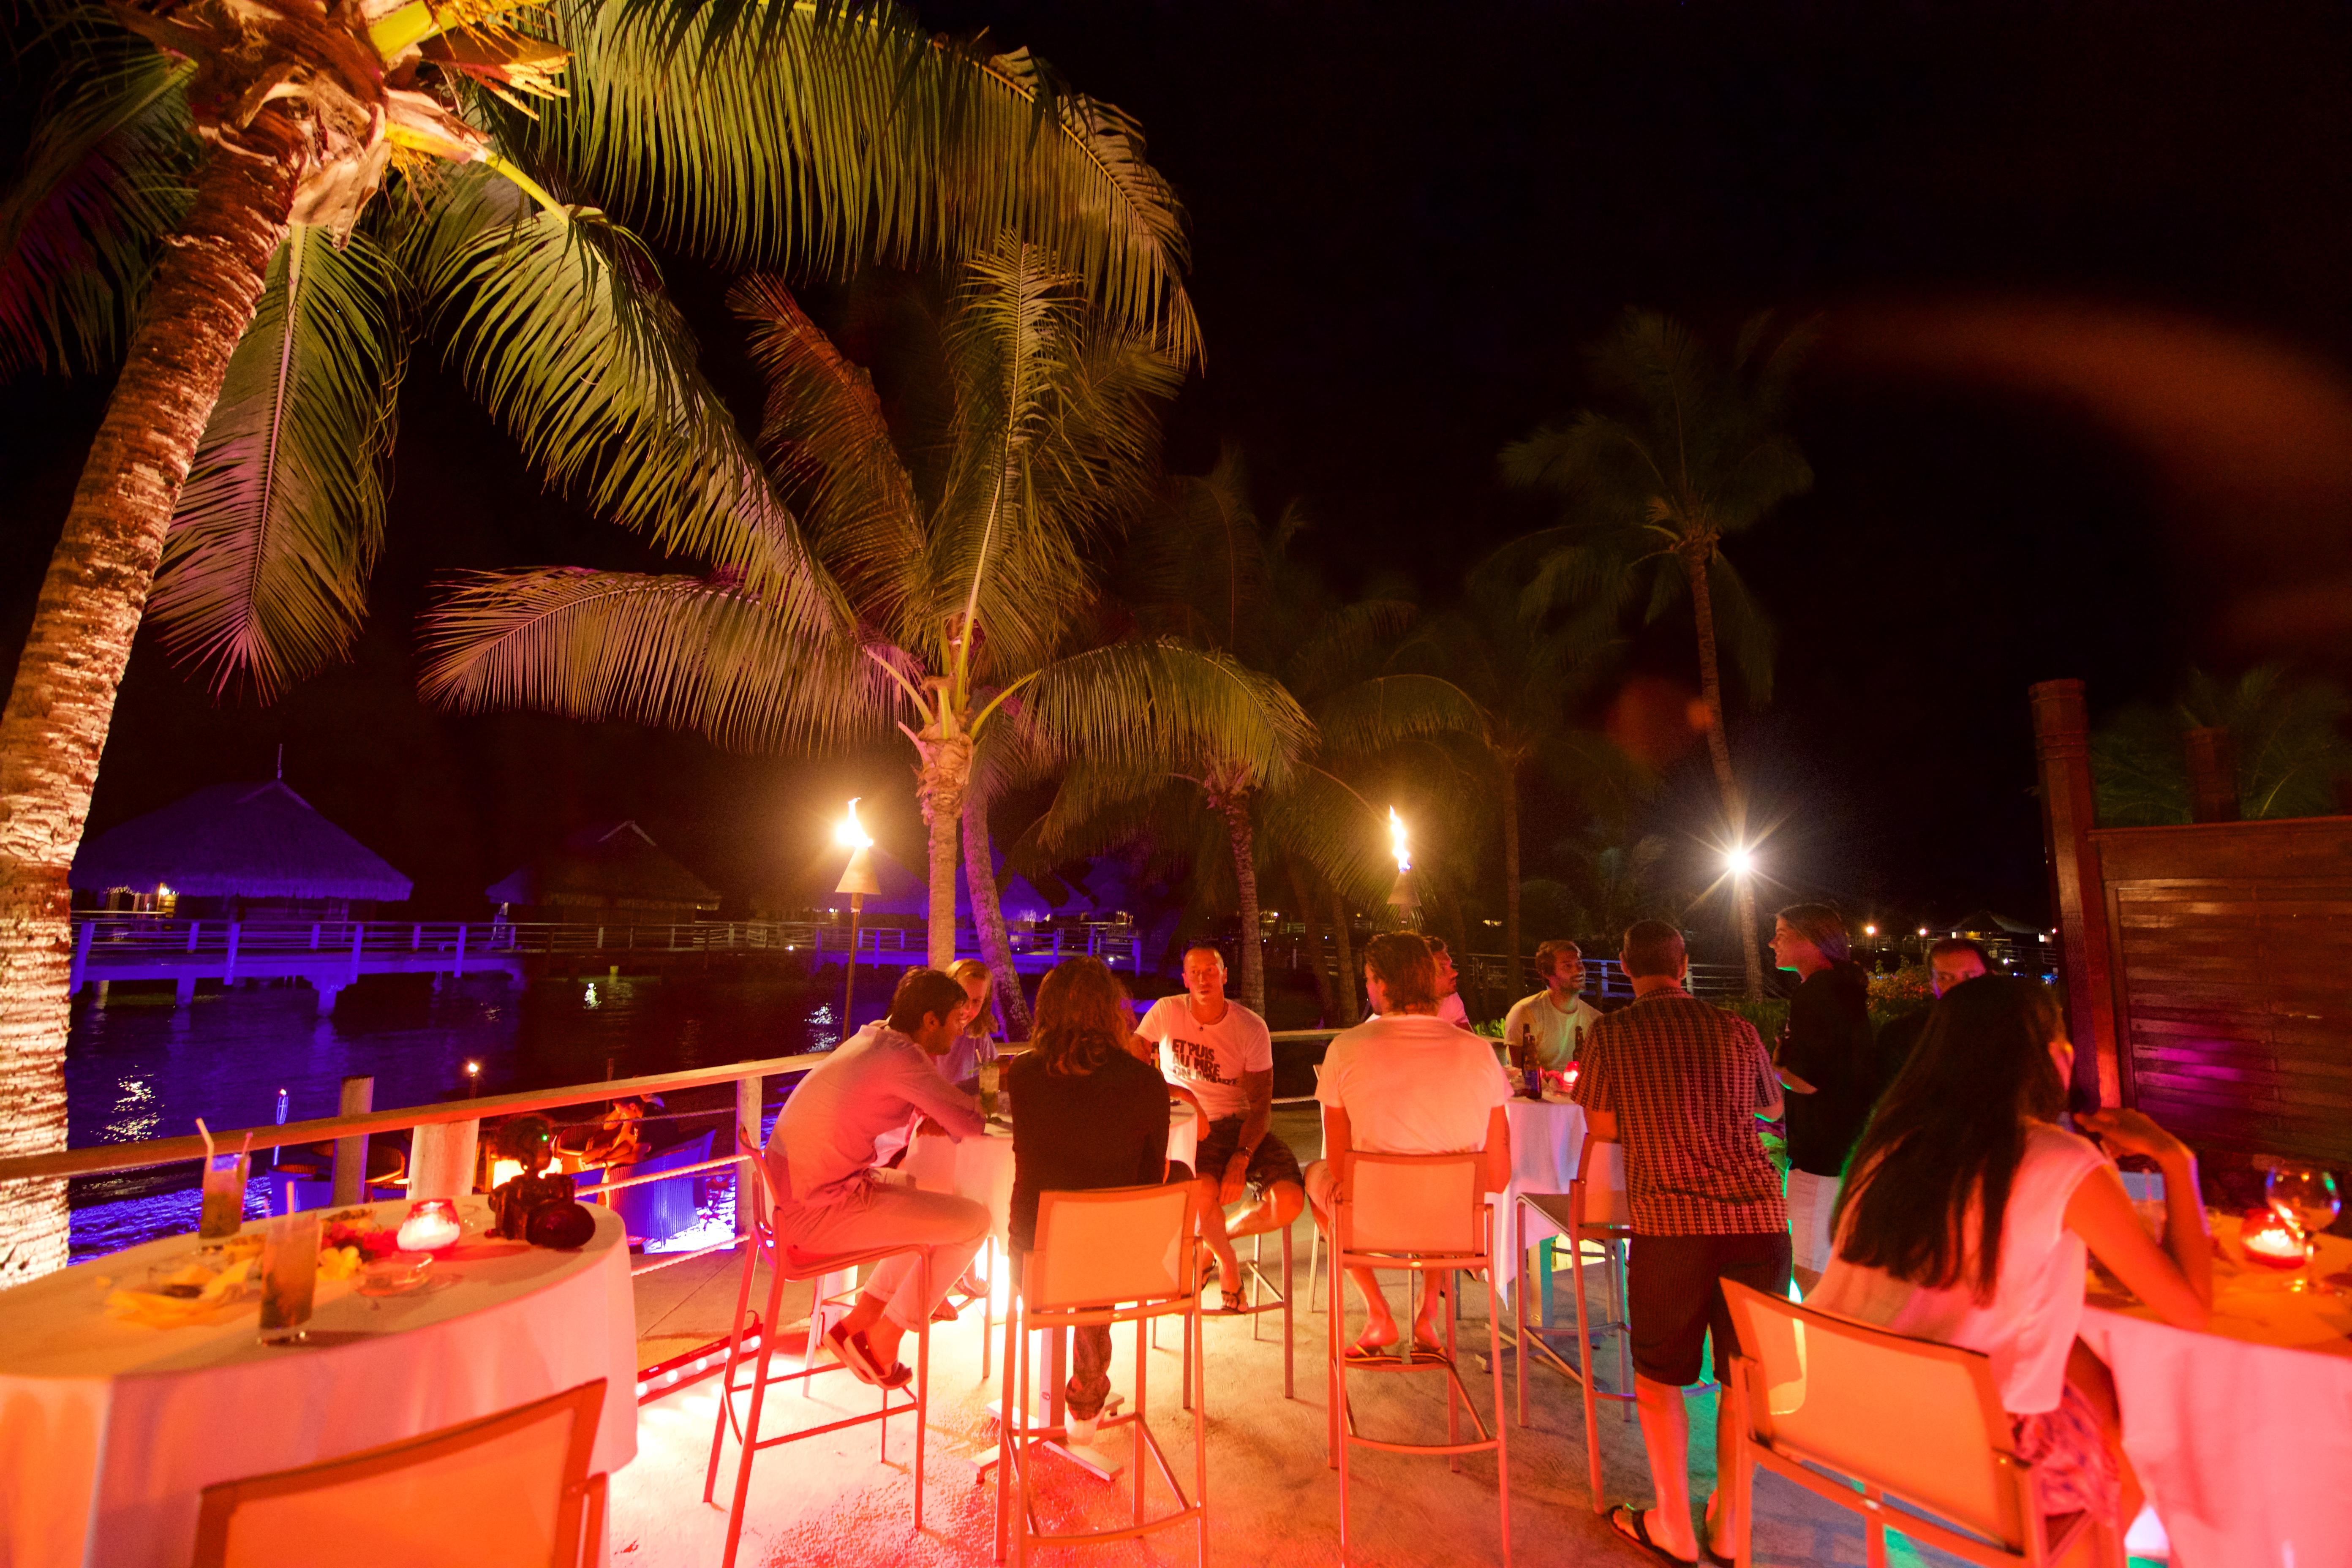 https://tahititourisme.es/wp-content/uploads/2018/03/RESTAURATION-Matahiehani-Lounge-Bar-featured_image-Tim_McKenna.jpg